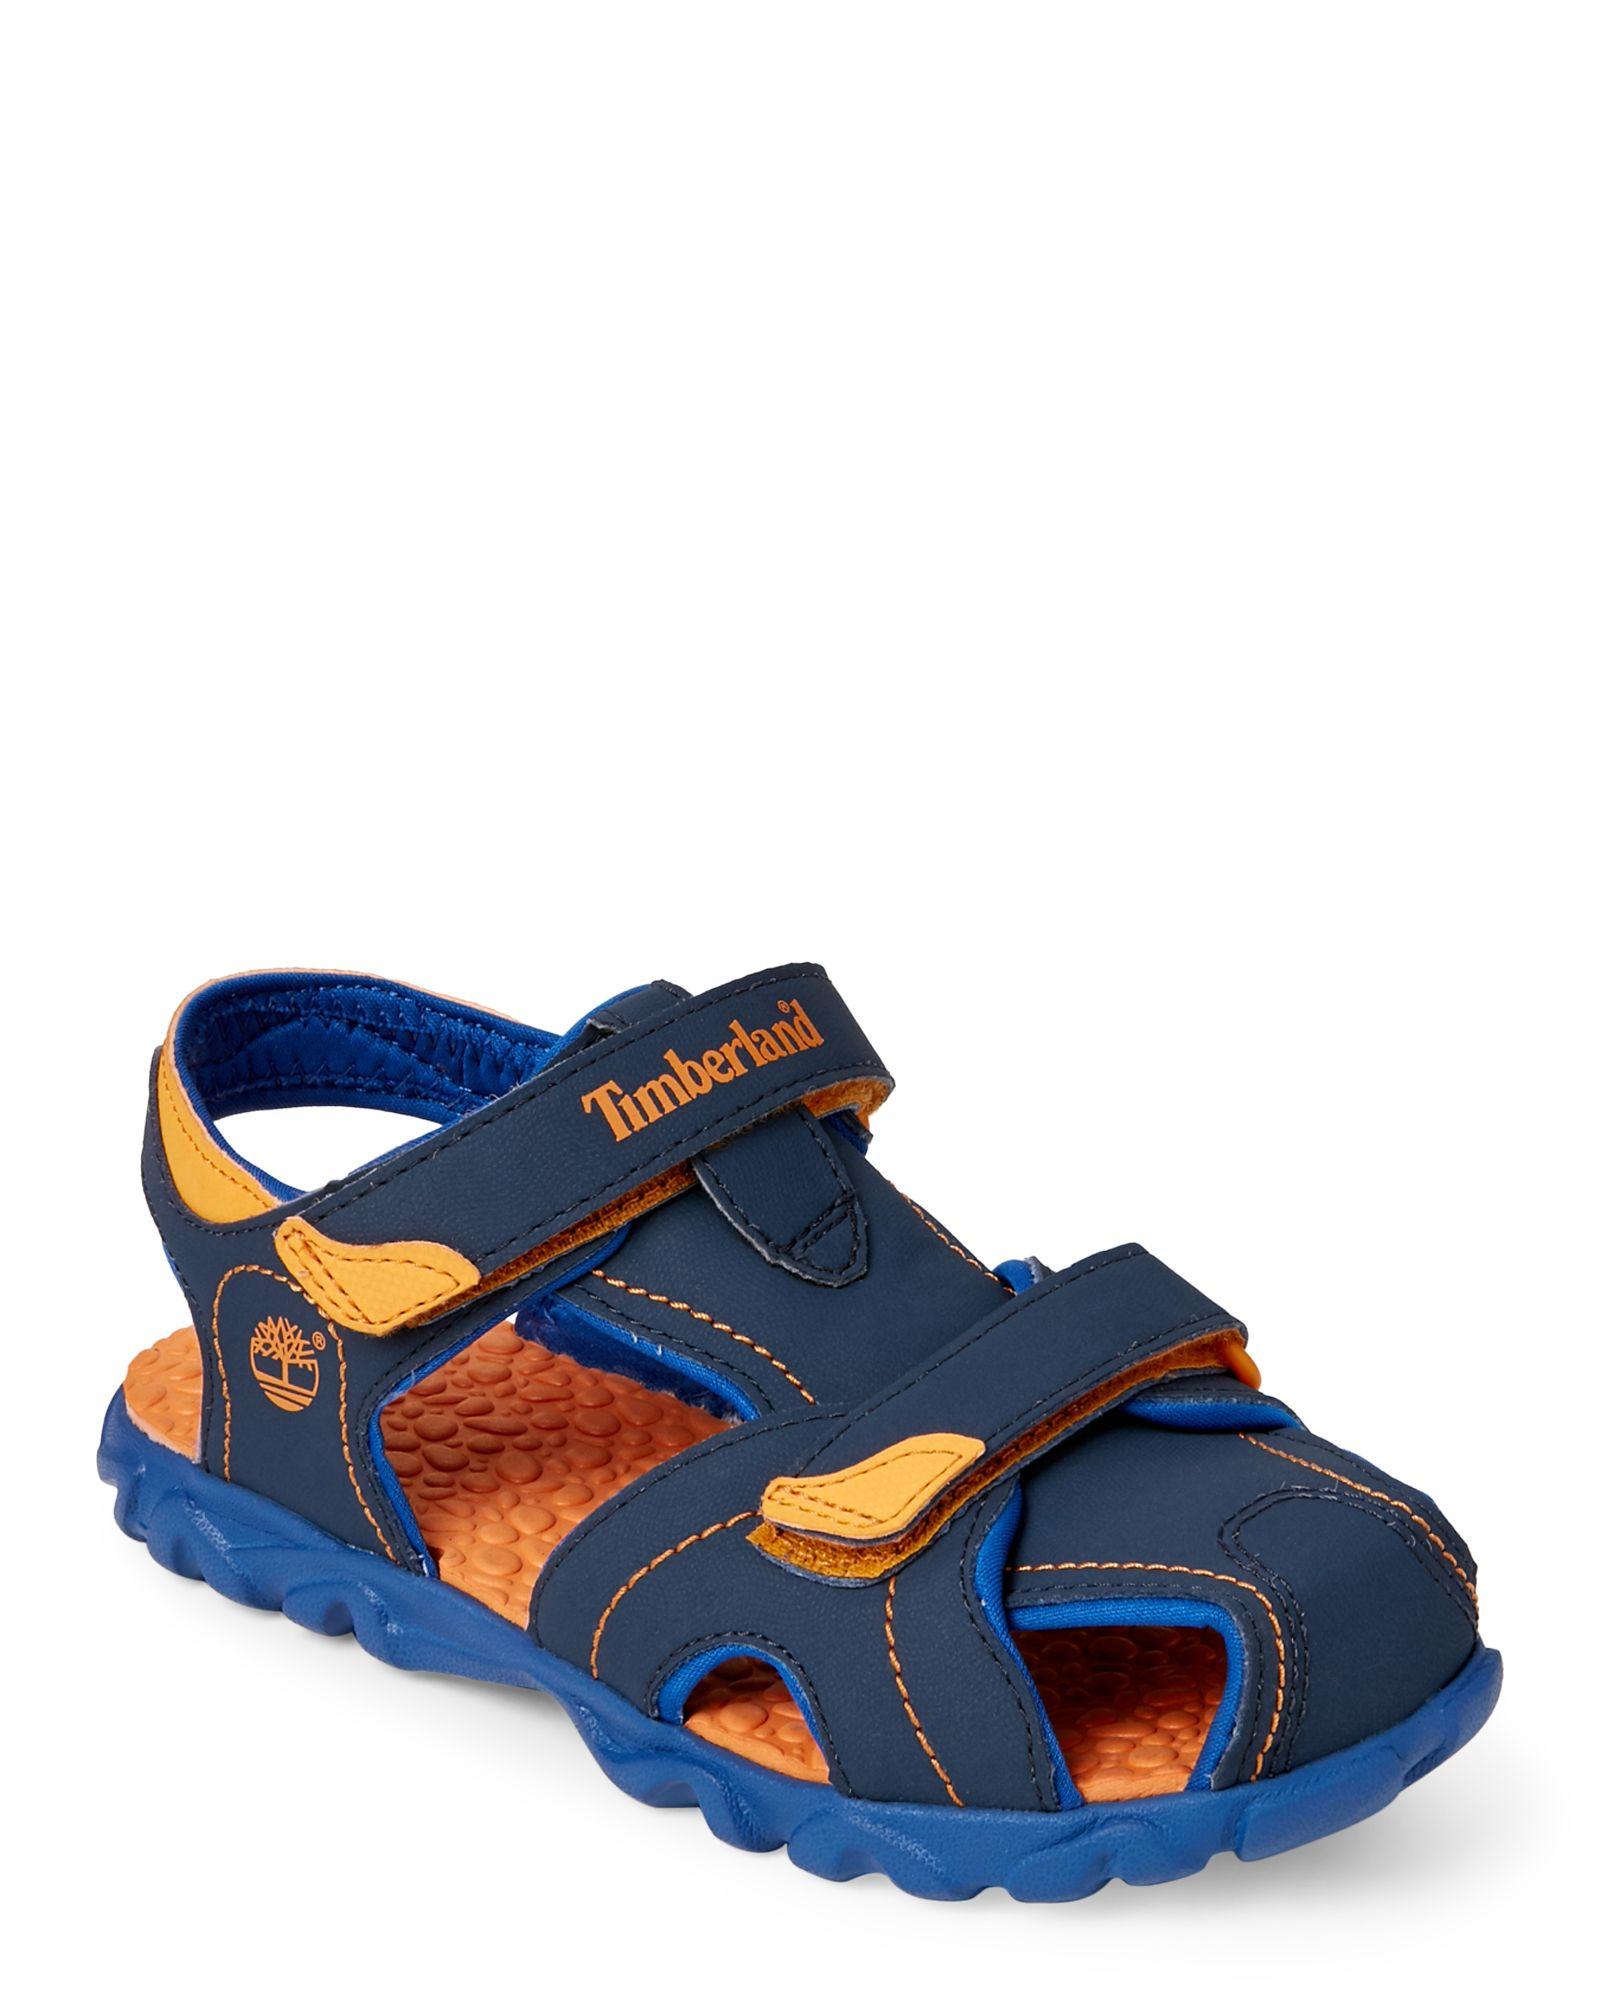 Boutique en ligne lo mas baratas ahorre hasta 80% Timberland (Kids Boys) Blue & Orange Splashtown Closed Toe Water ...